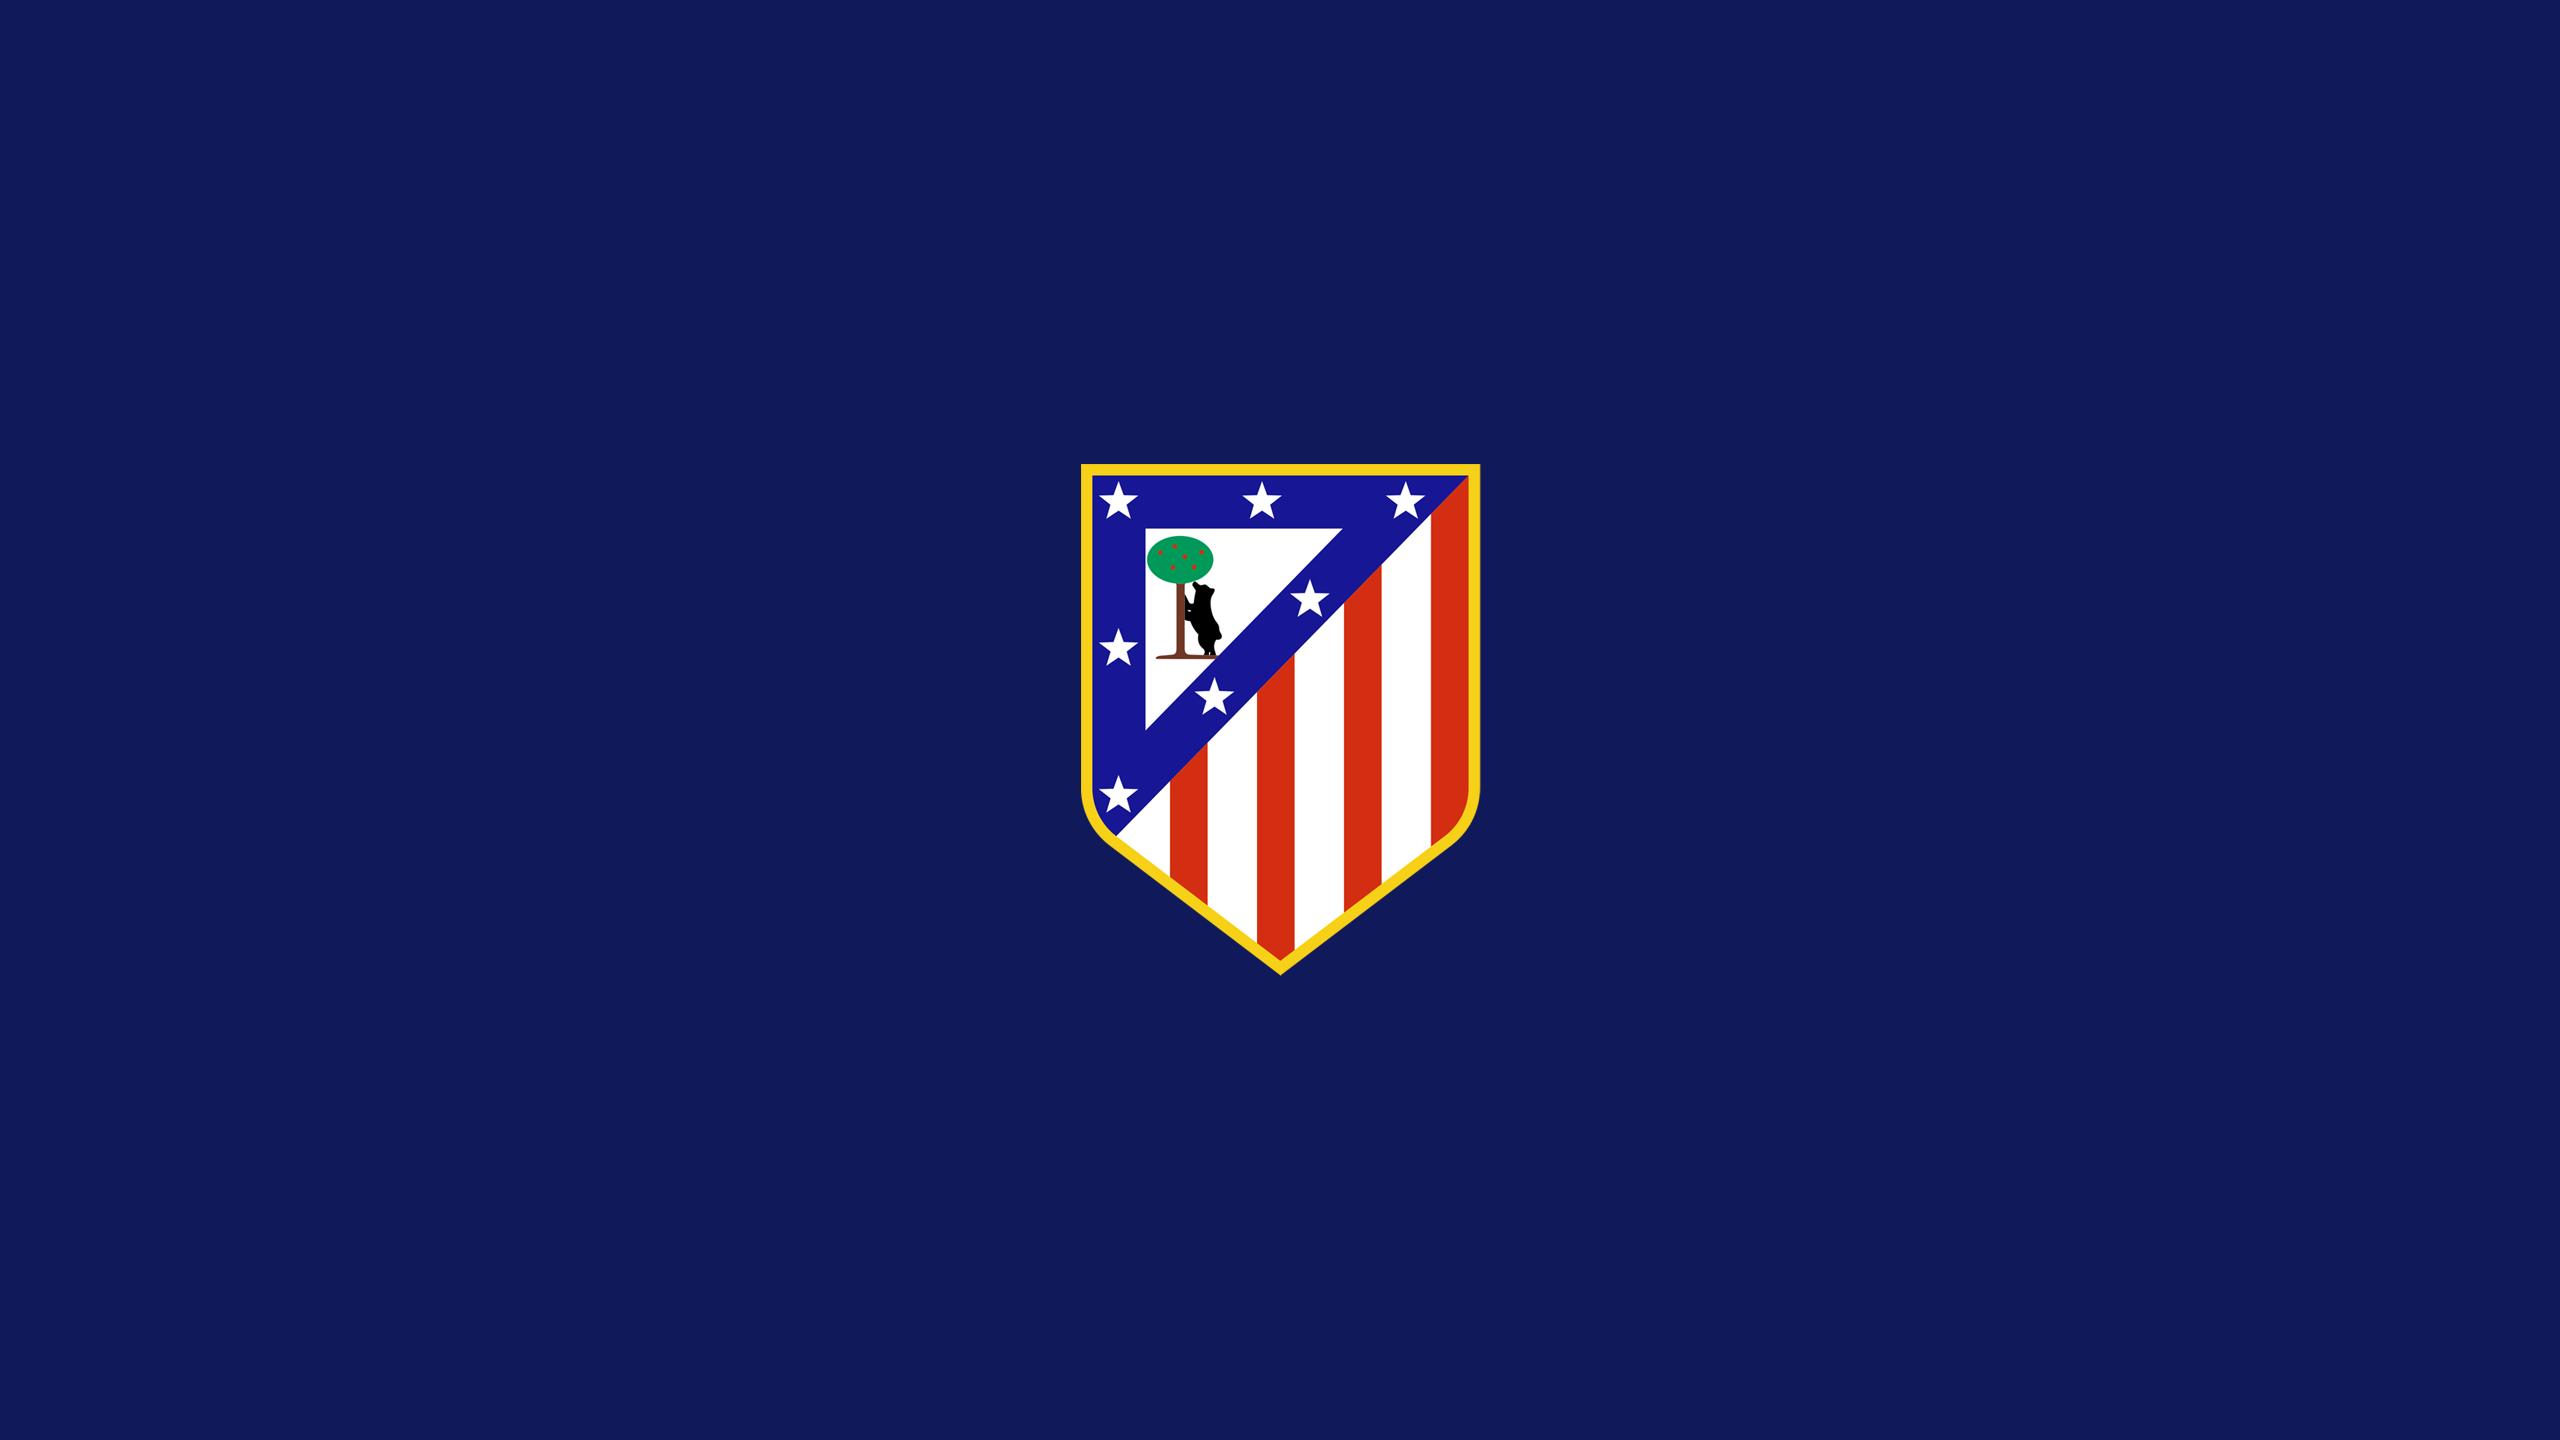 Atletico Madrid Wallpaper 2560x1440